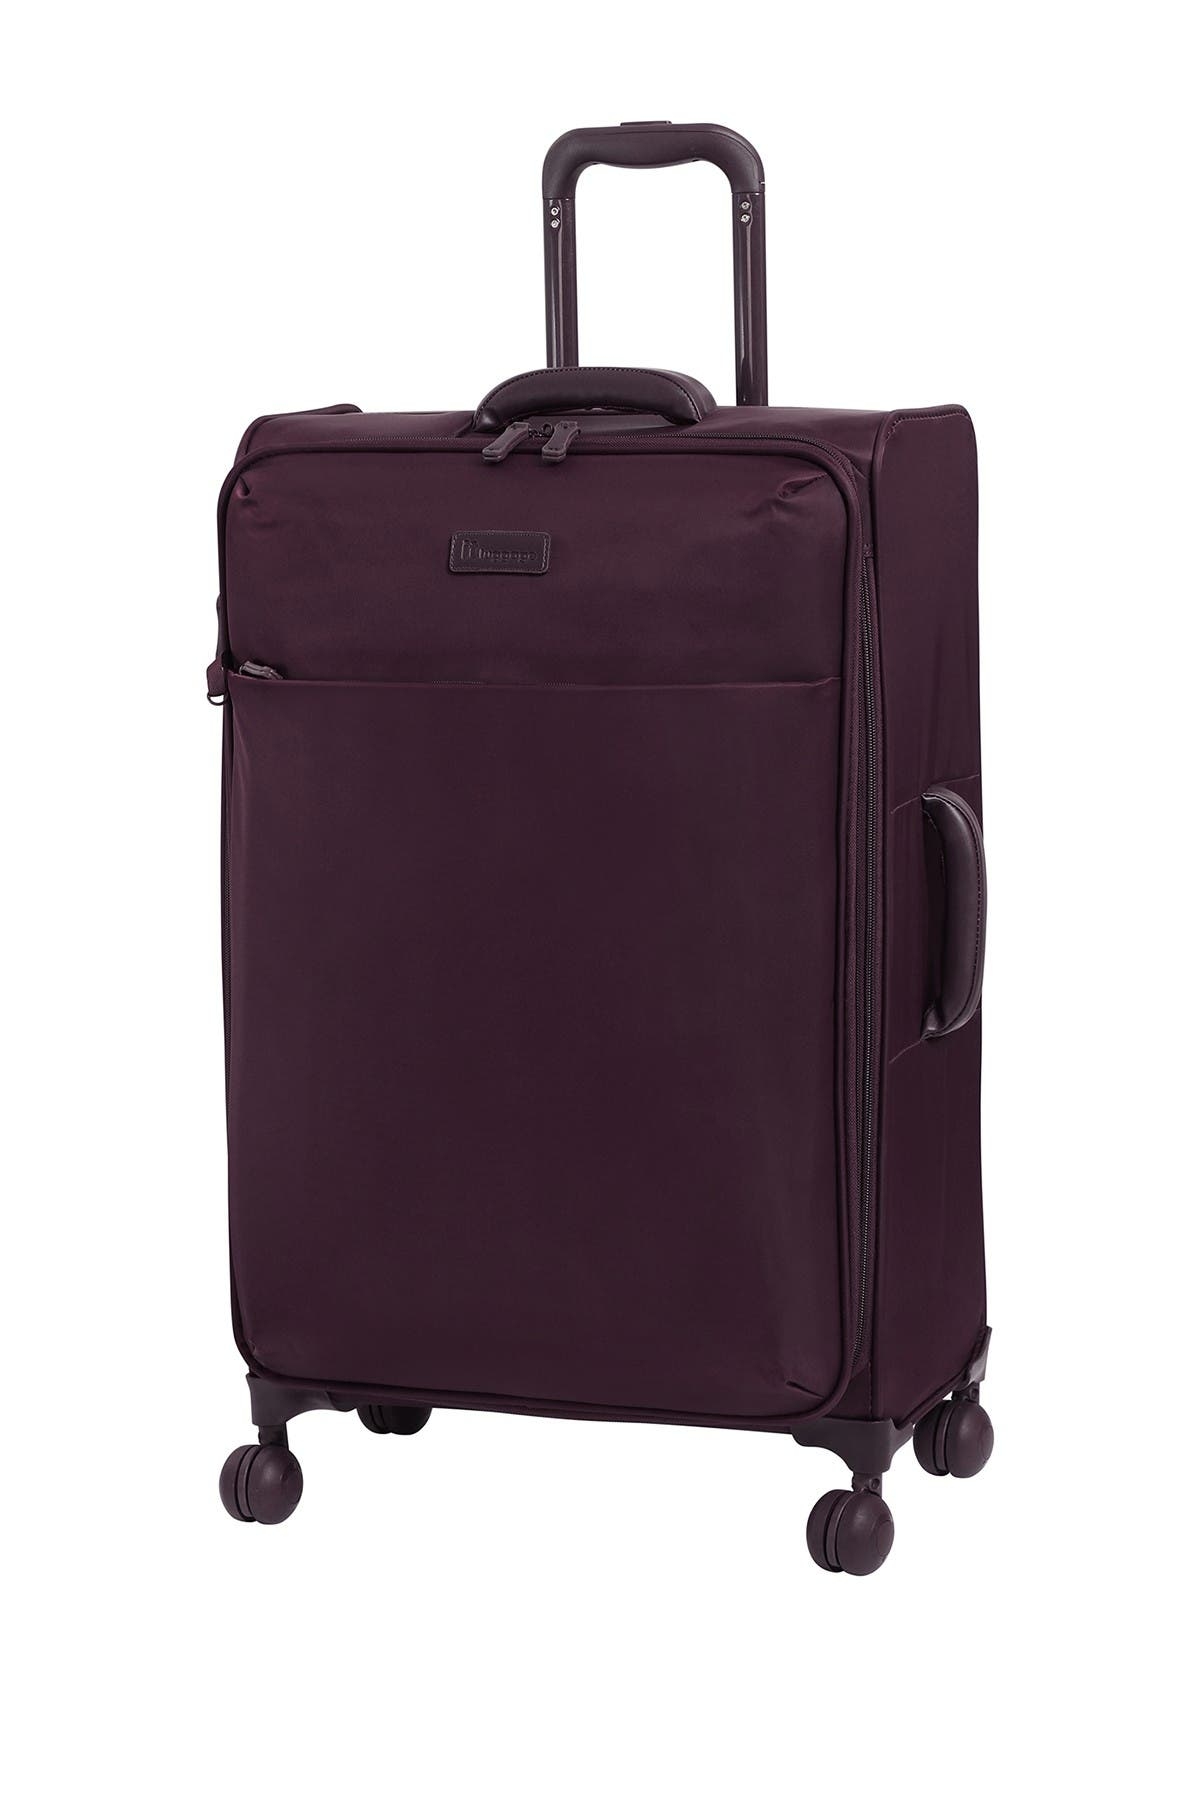 "Image of it luggage Lustrous 28"" Softside Spinner Expandable 8-Wheel Spinner Luggage Set"